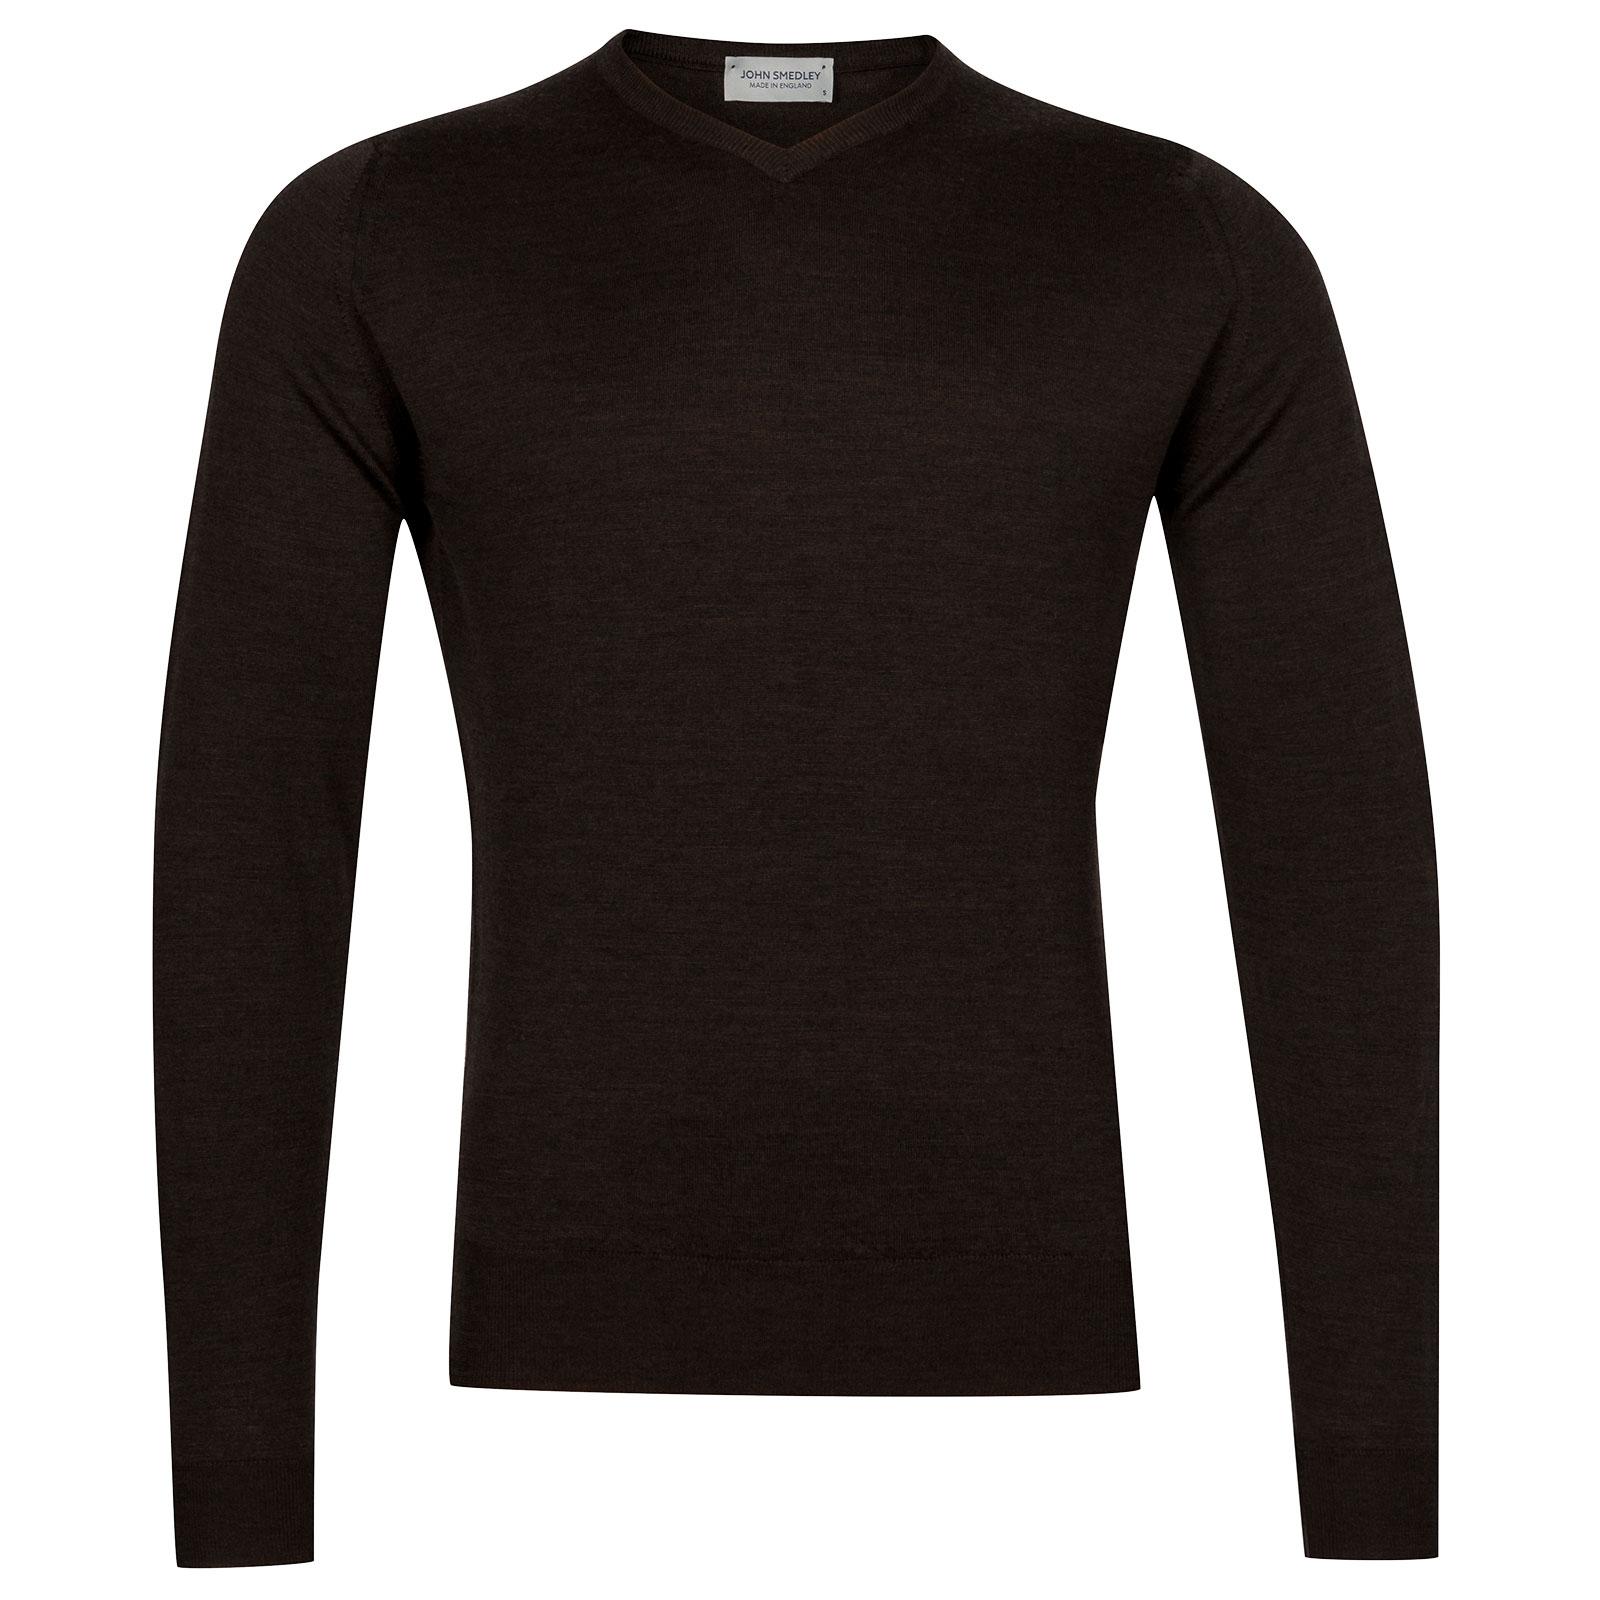 John Smedley Genoa Merino Wool Pullover in Chestnut-XXL